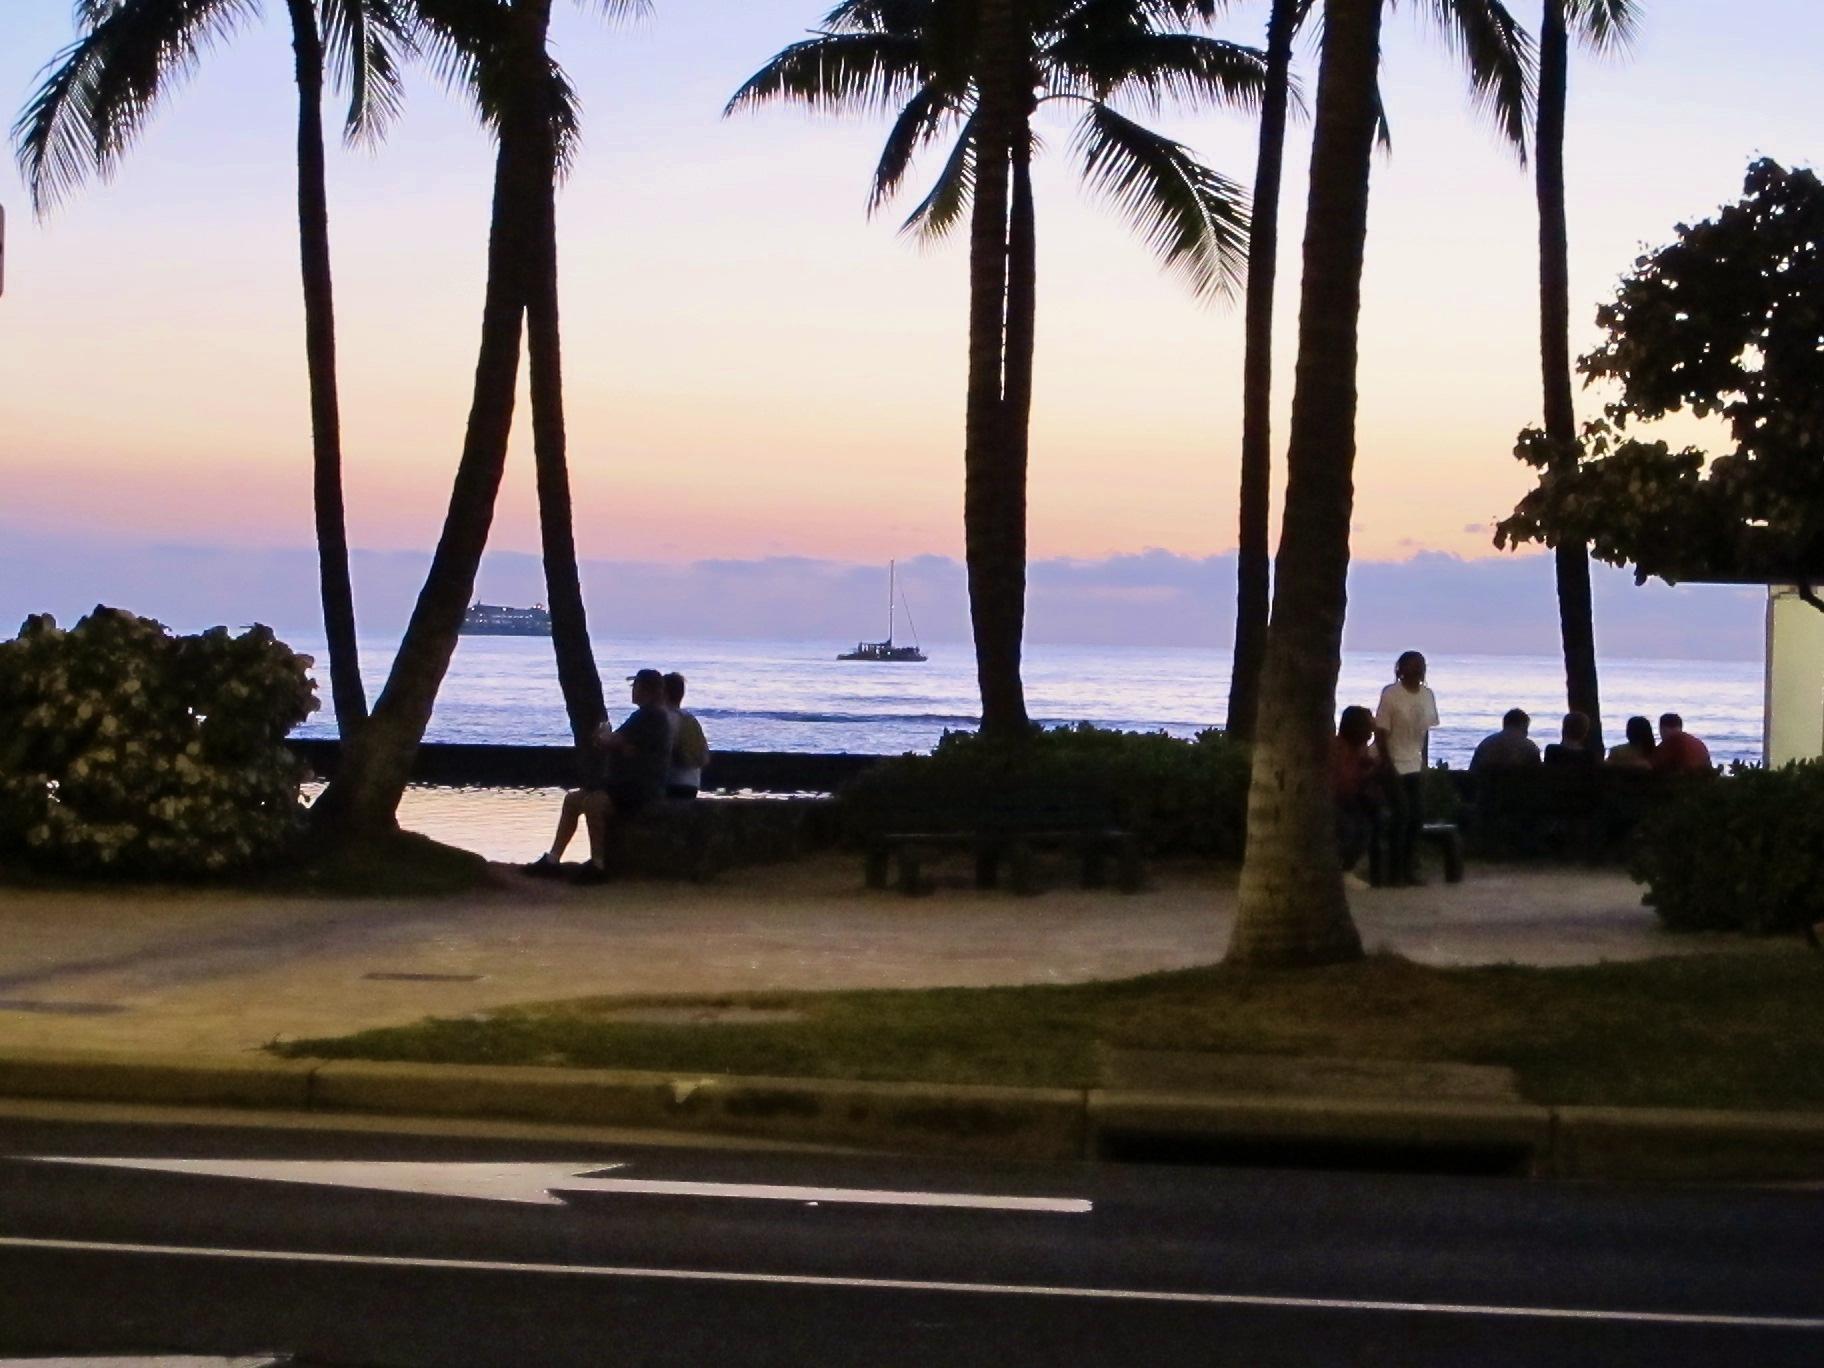 Hawaii Oahu 夕暮れのワイキキ・ビーチ